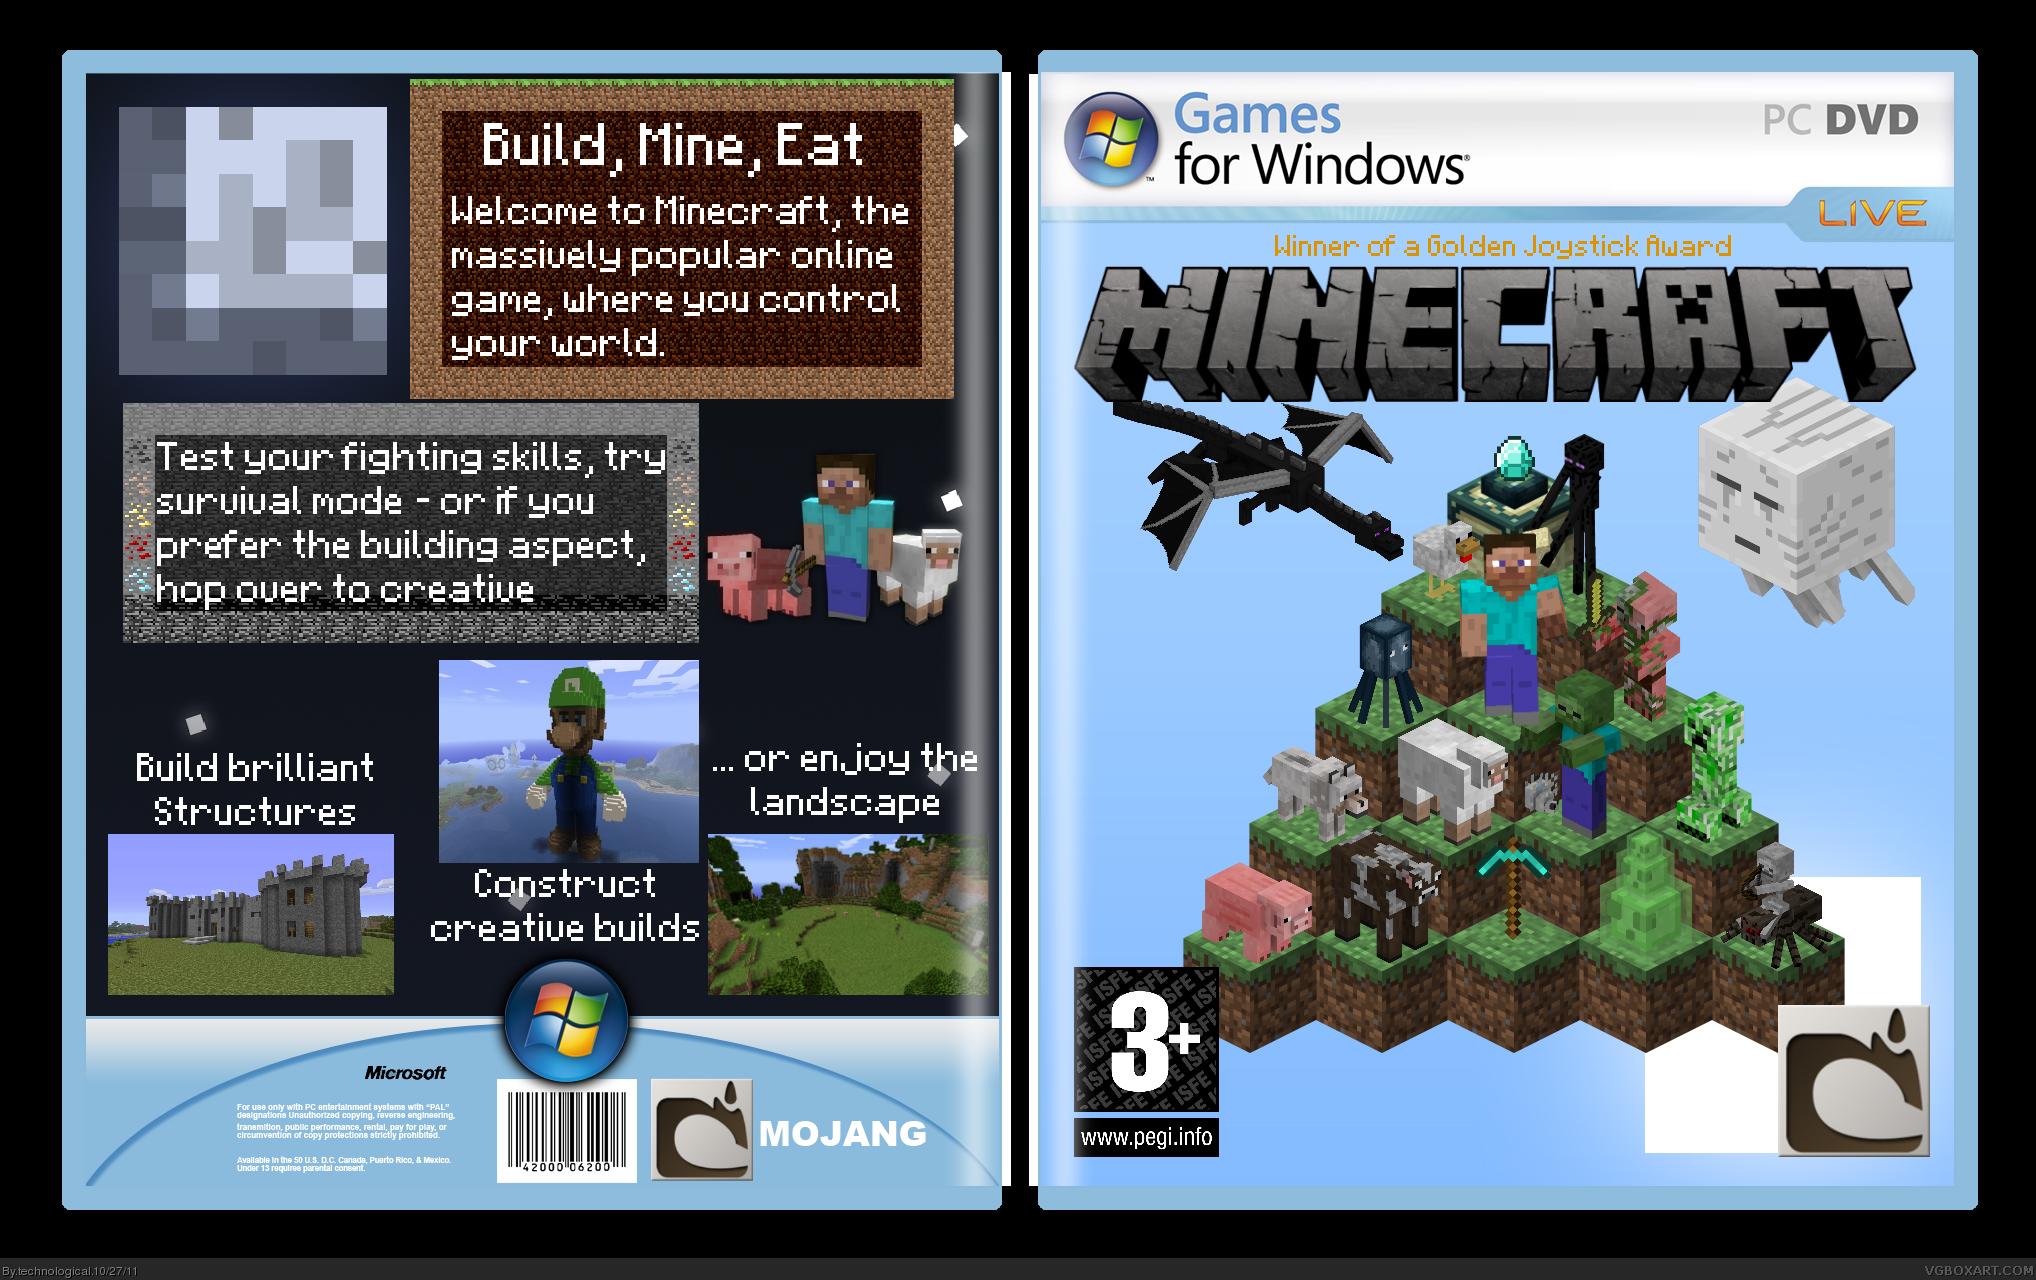 Minecraft Covers for Facebook | fbCoverLover.com